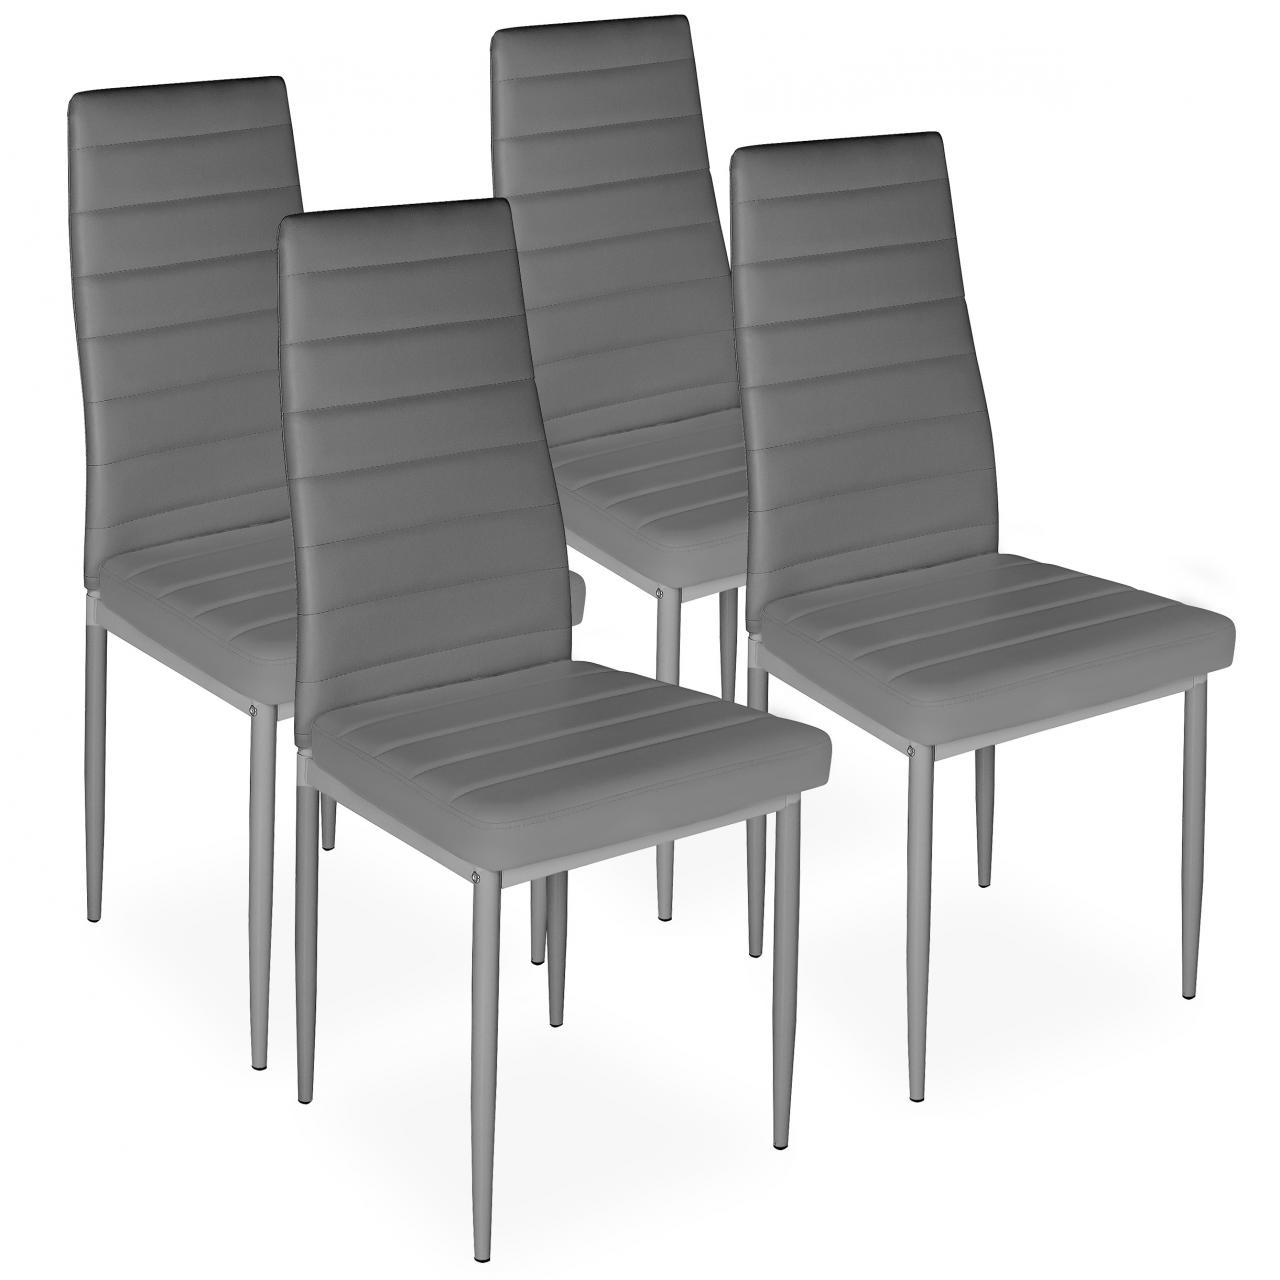 Upholstered Kitchen Stools Uk: 4 Piece Dining Chair Set Upholstered Chair Kitchen Dining